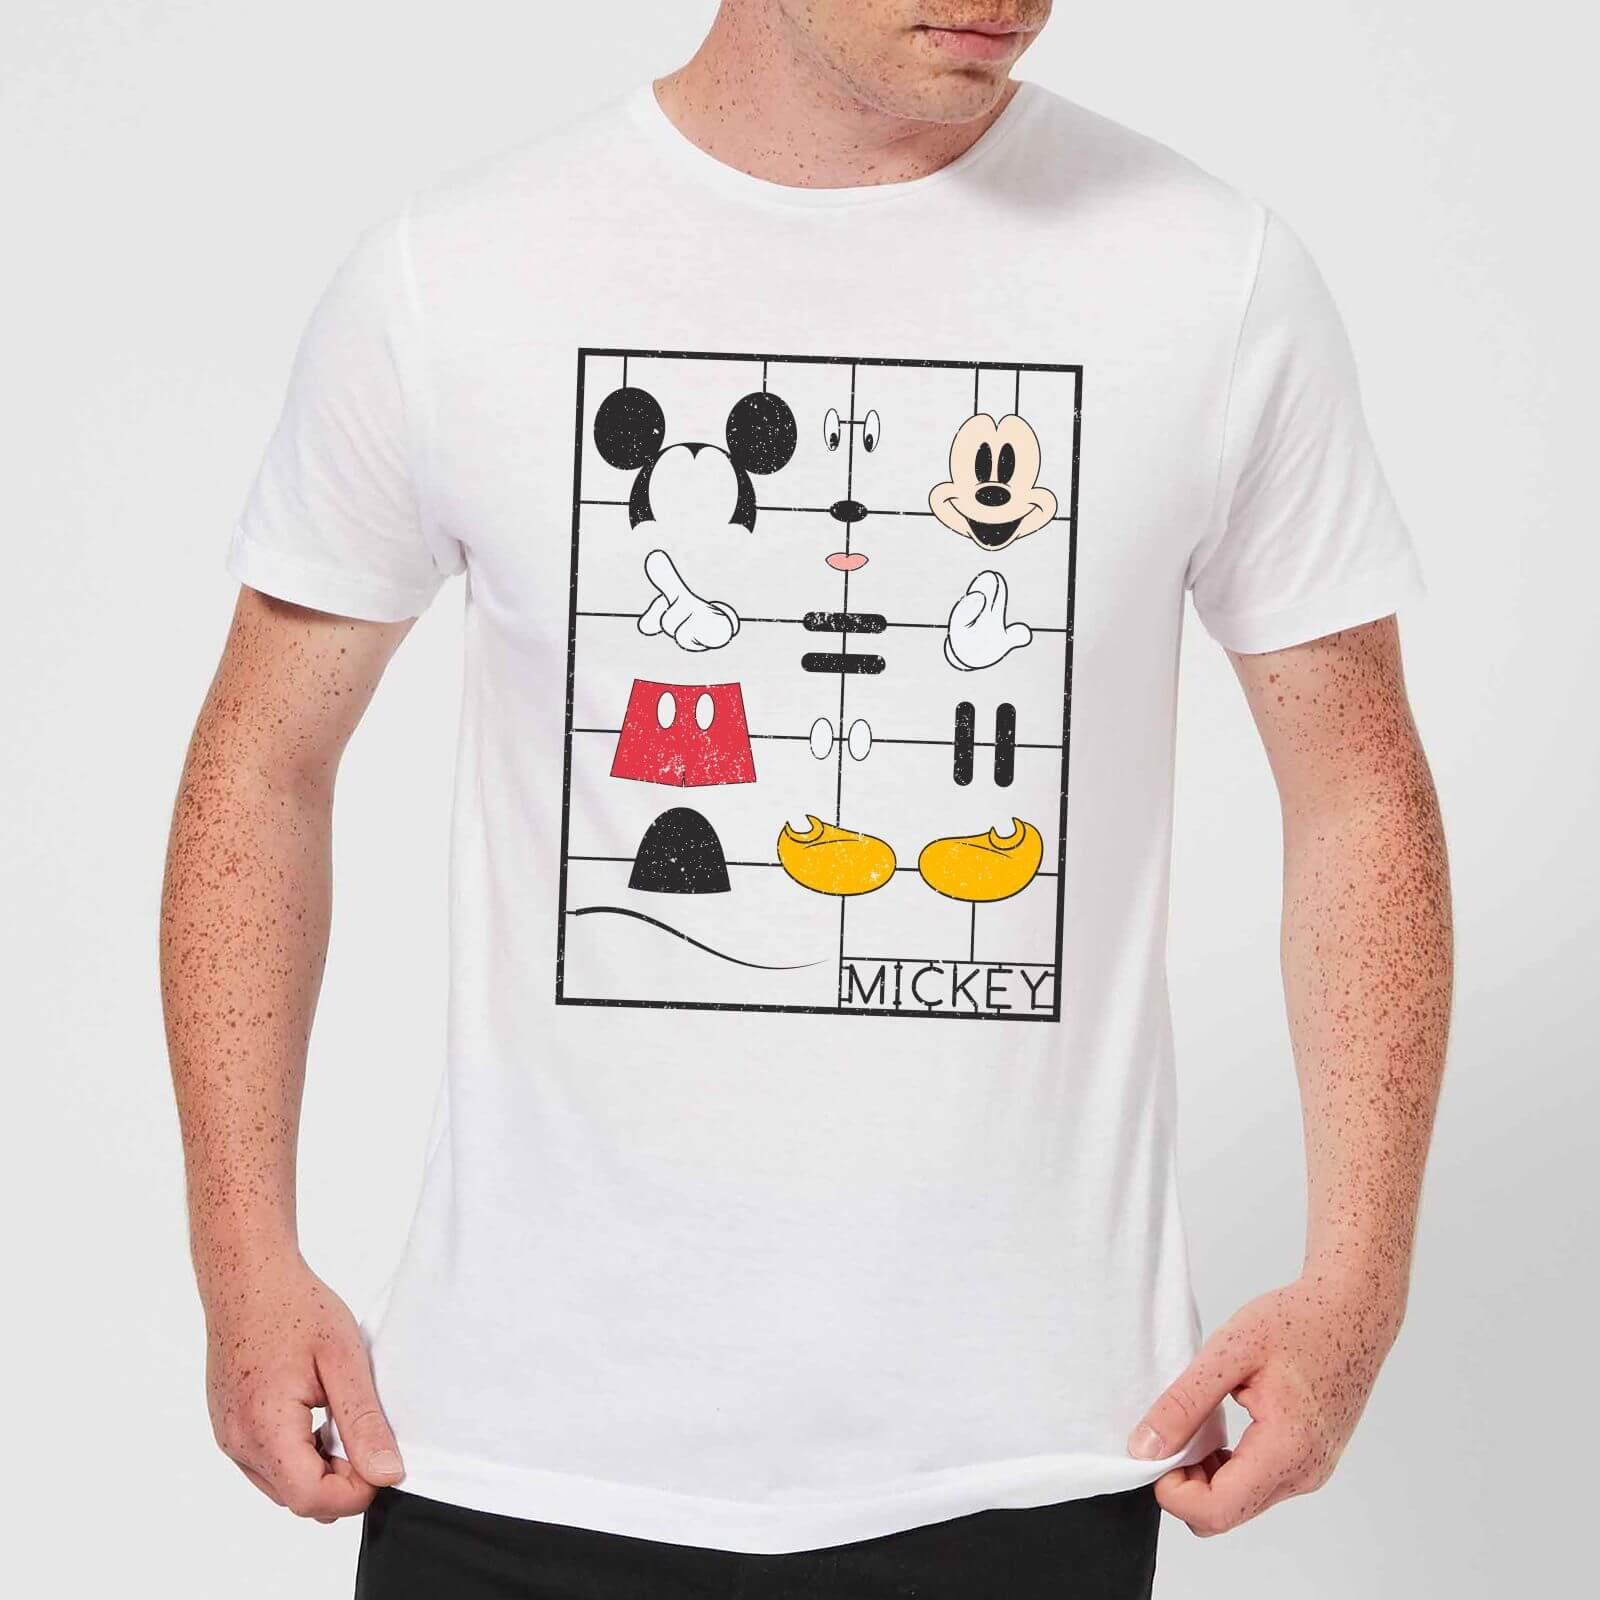 Disney Disney Mickey Mouse Construction Kit T-Shirt - White - 3XL - White